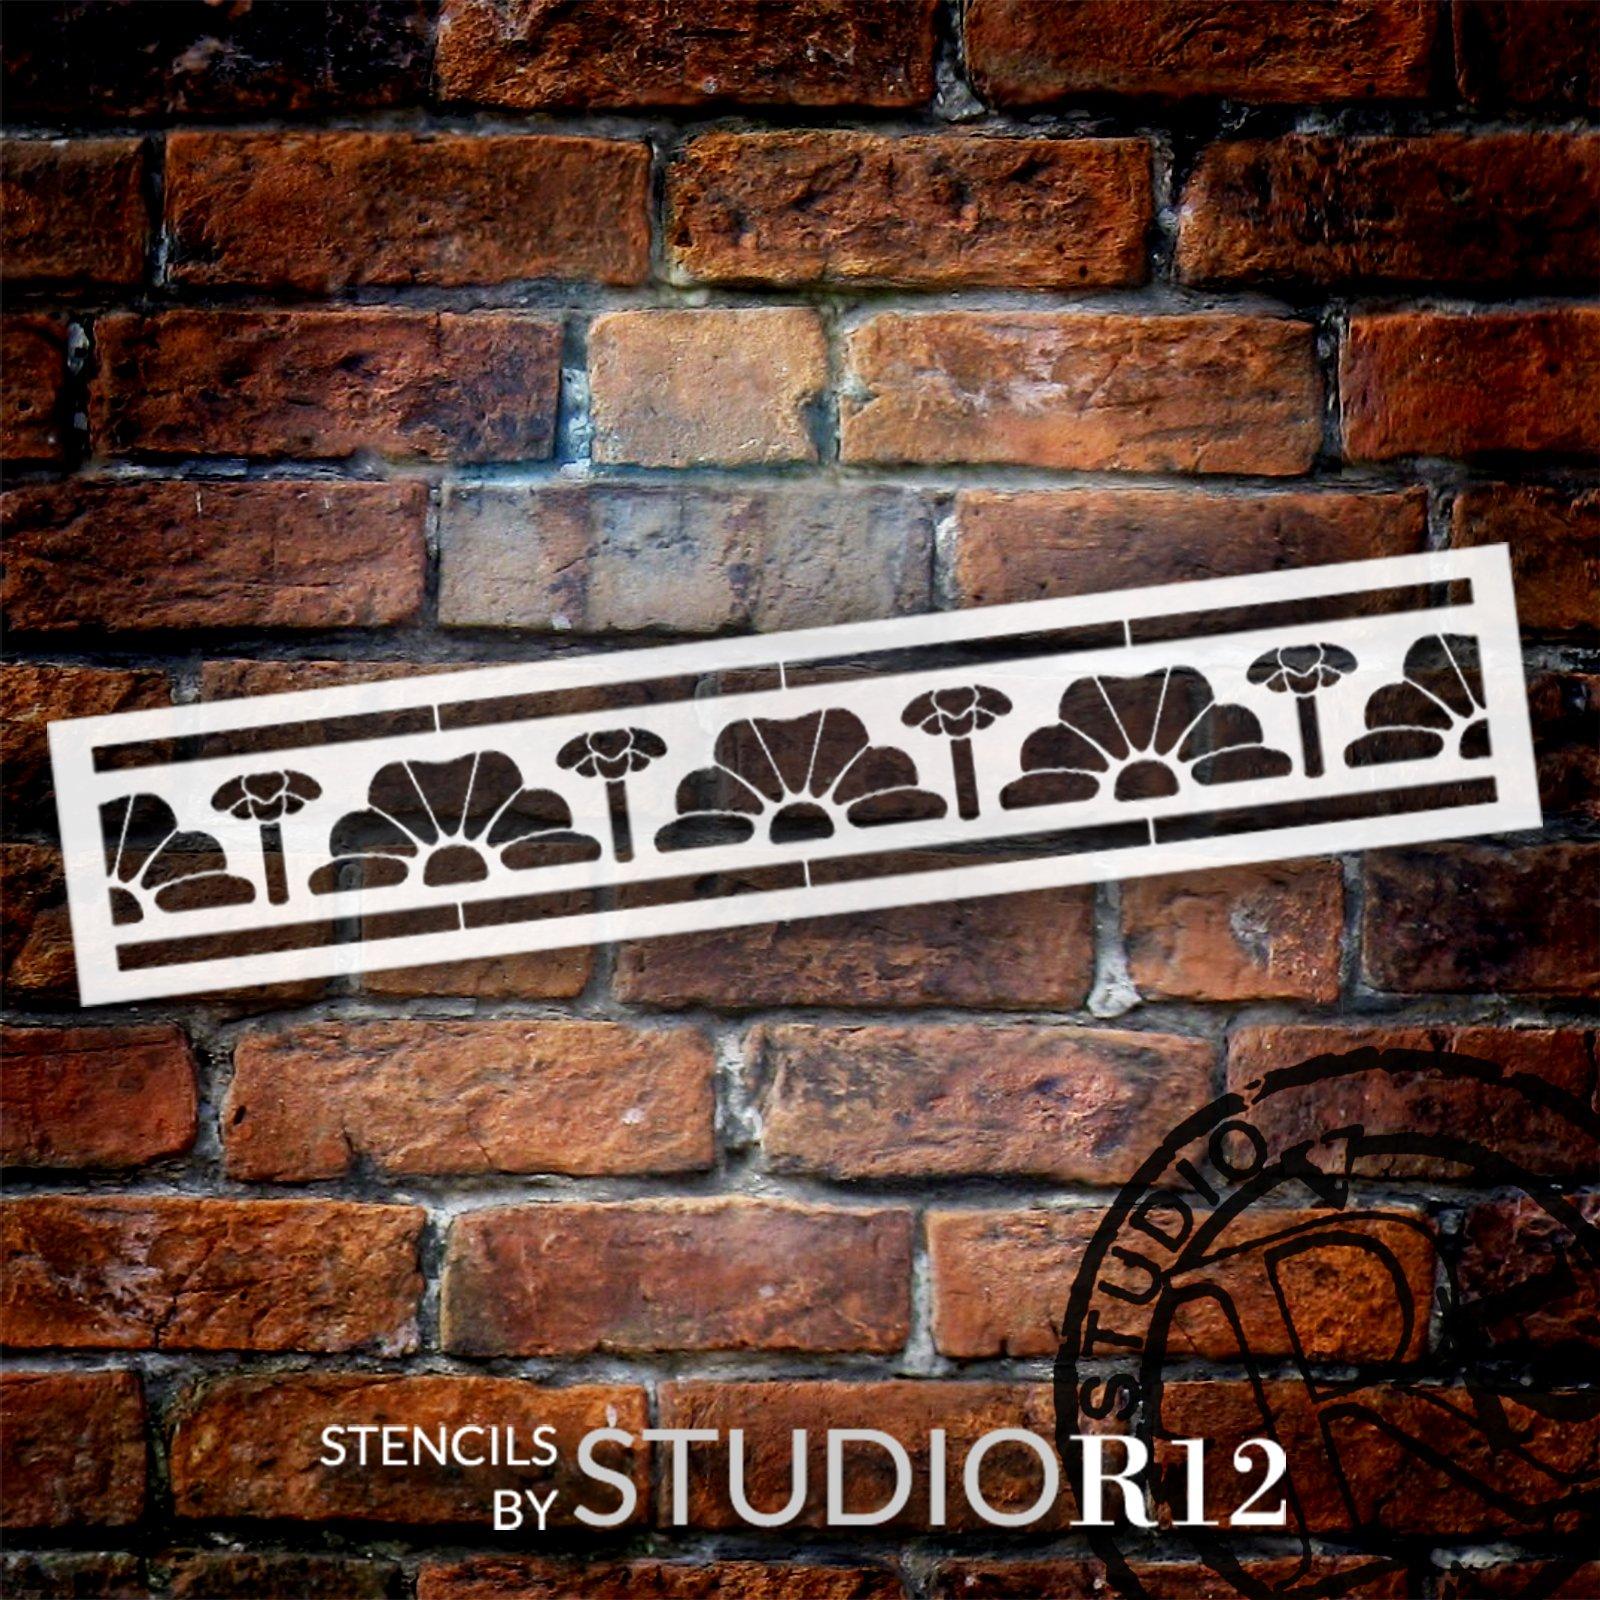 Medieval Flower Bud Band Stencil by StudioR12 | DIY Backsplash Pattern Home Decor | Craft & Paint Wood Sign | Reusable Mylar Template | Select Size